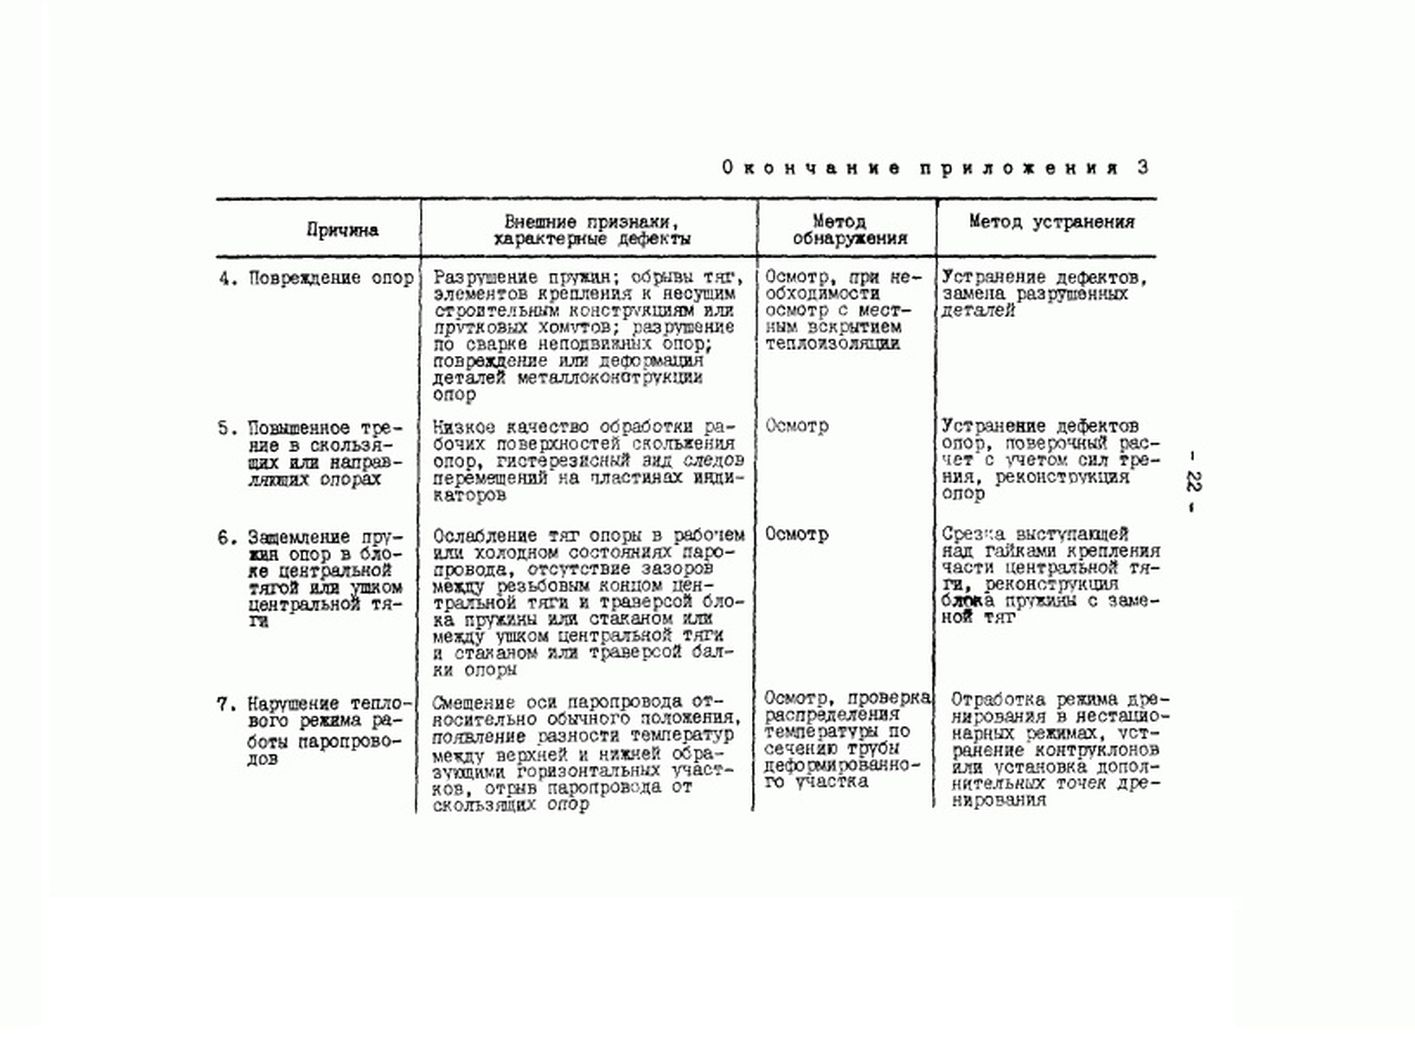 РД 34.39.301-87 стр.22